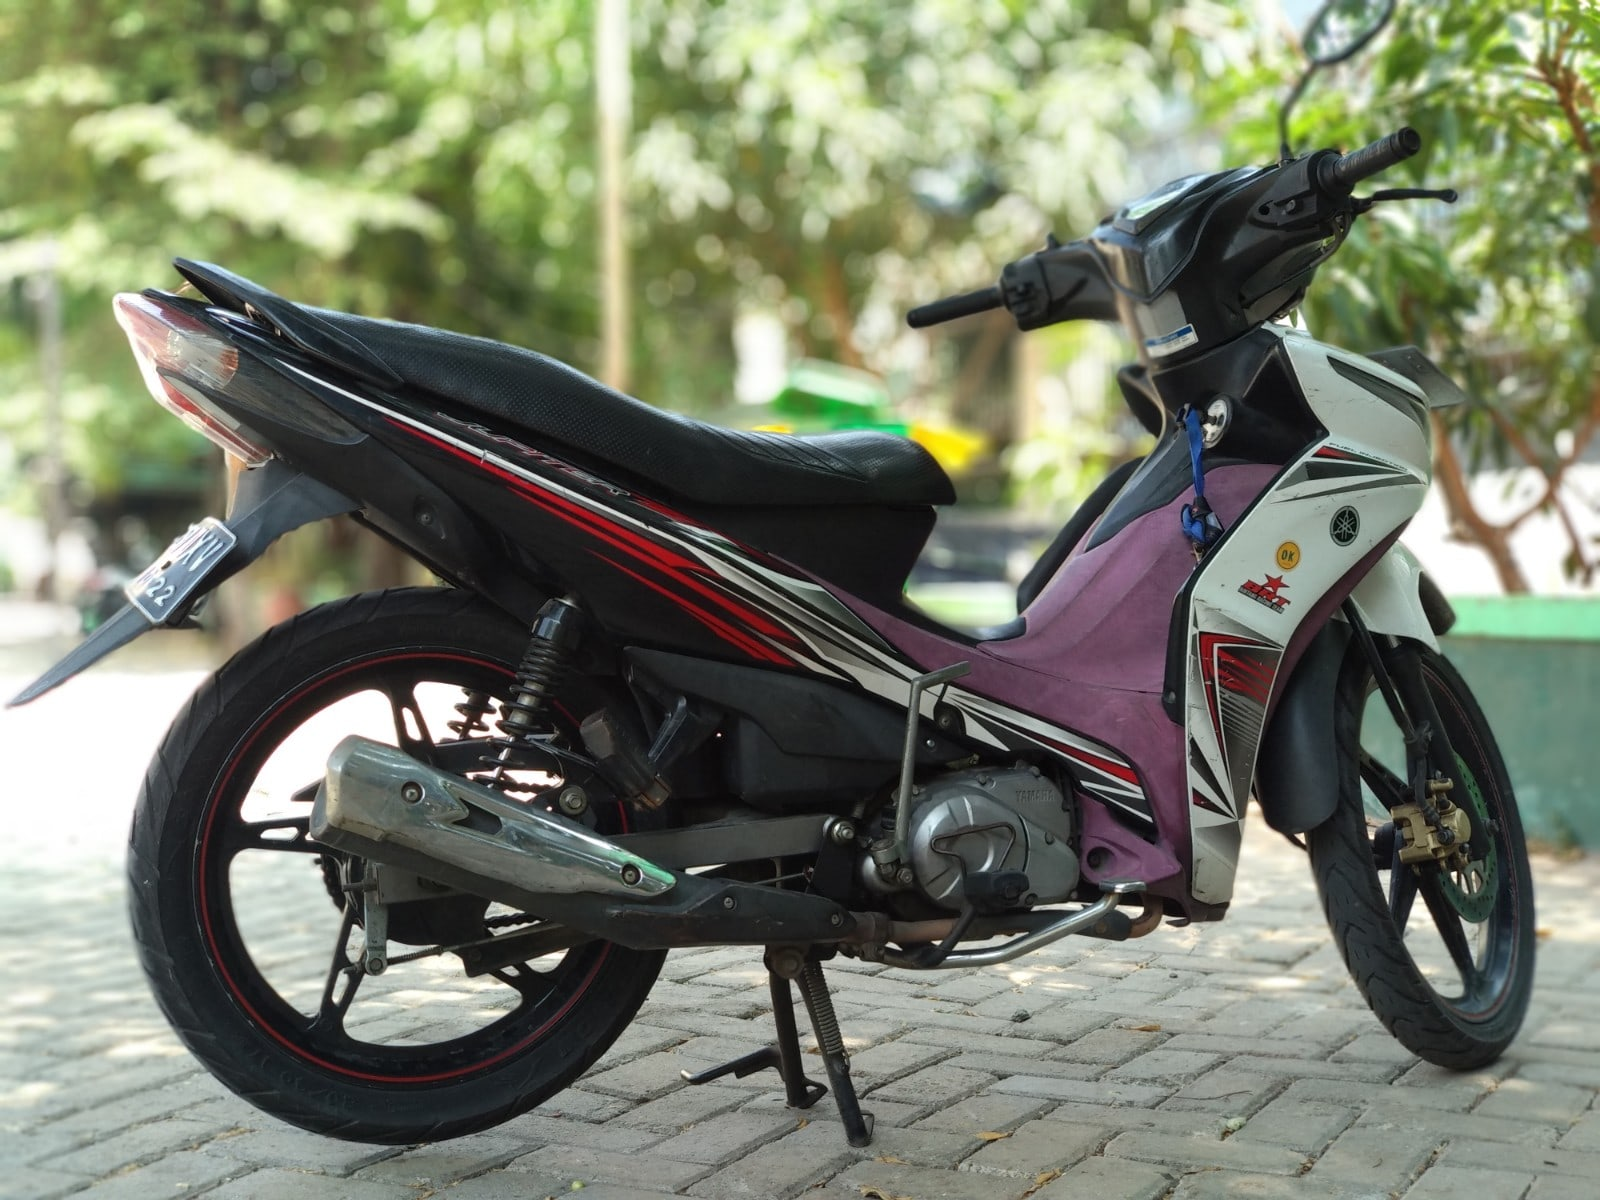 Ciri Ciri Dinamo Starter Yamaha Jupiter Z1 Harus Ganti Jakmotor Com